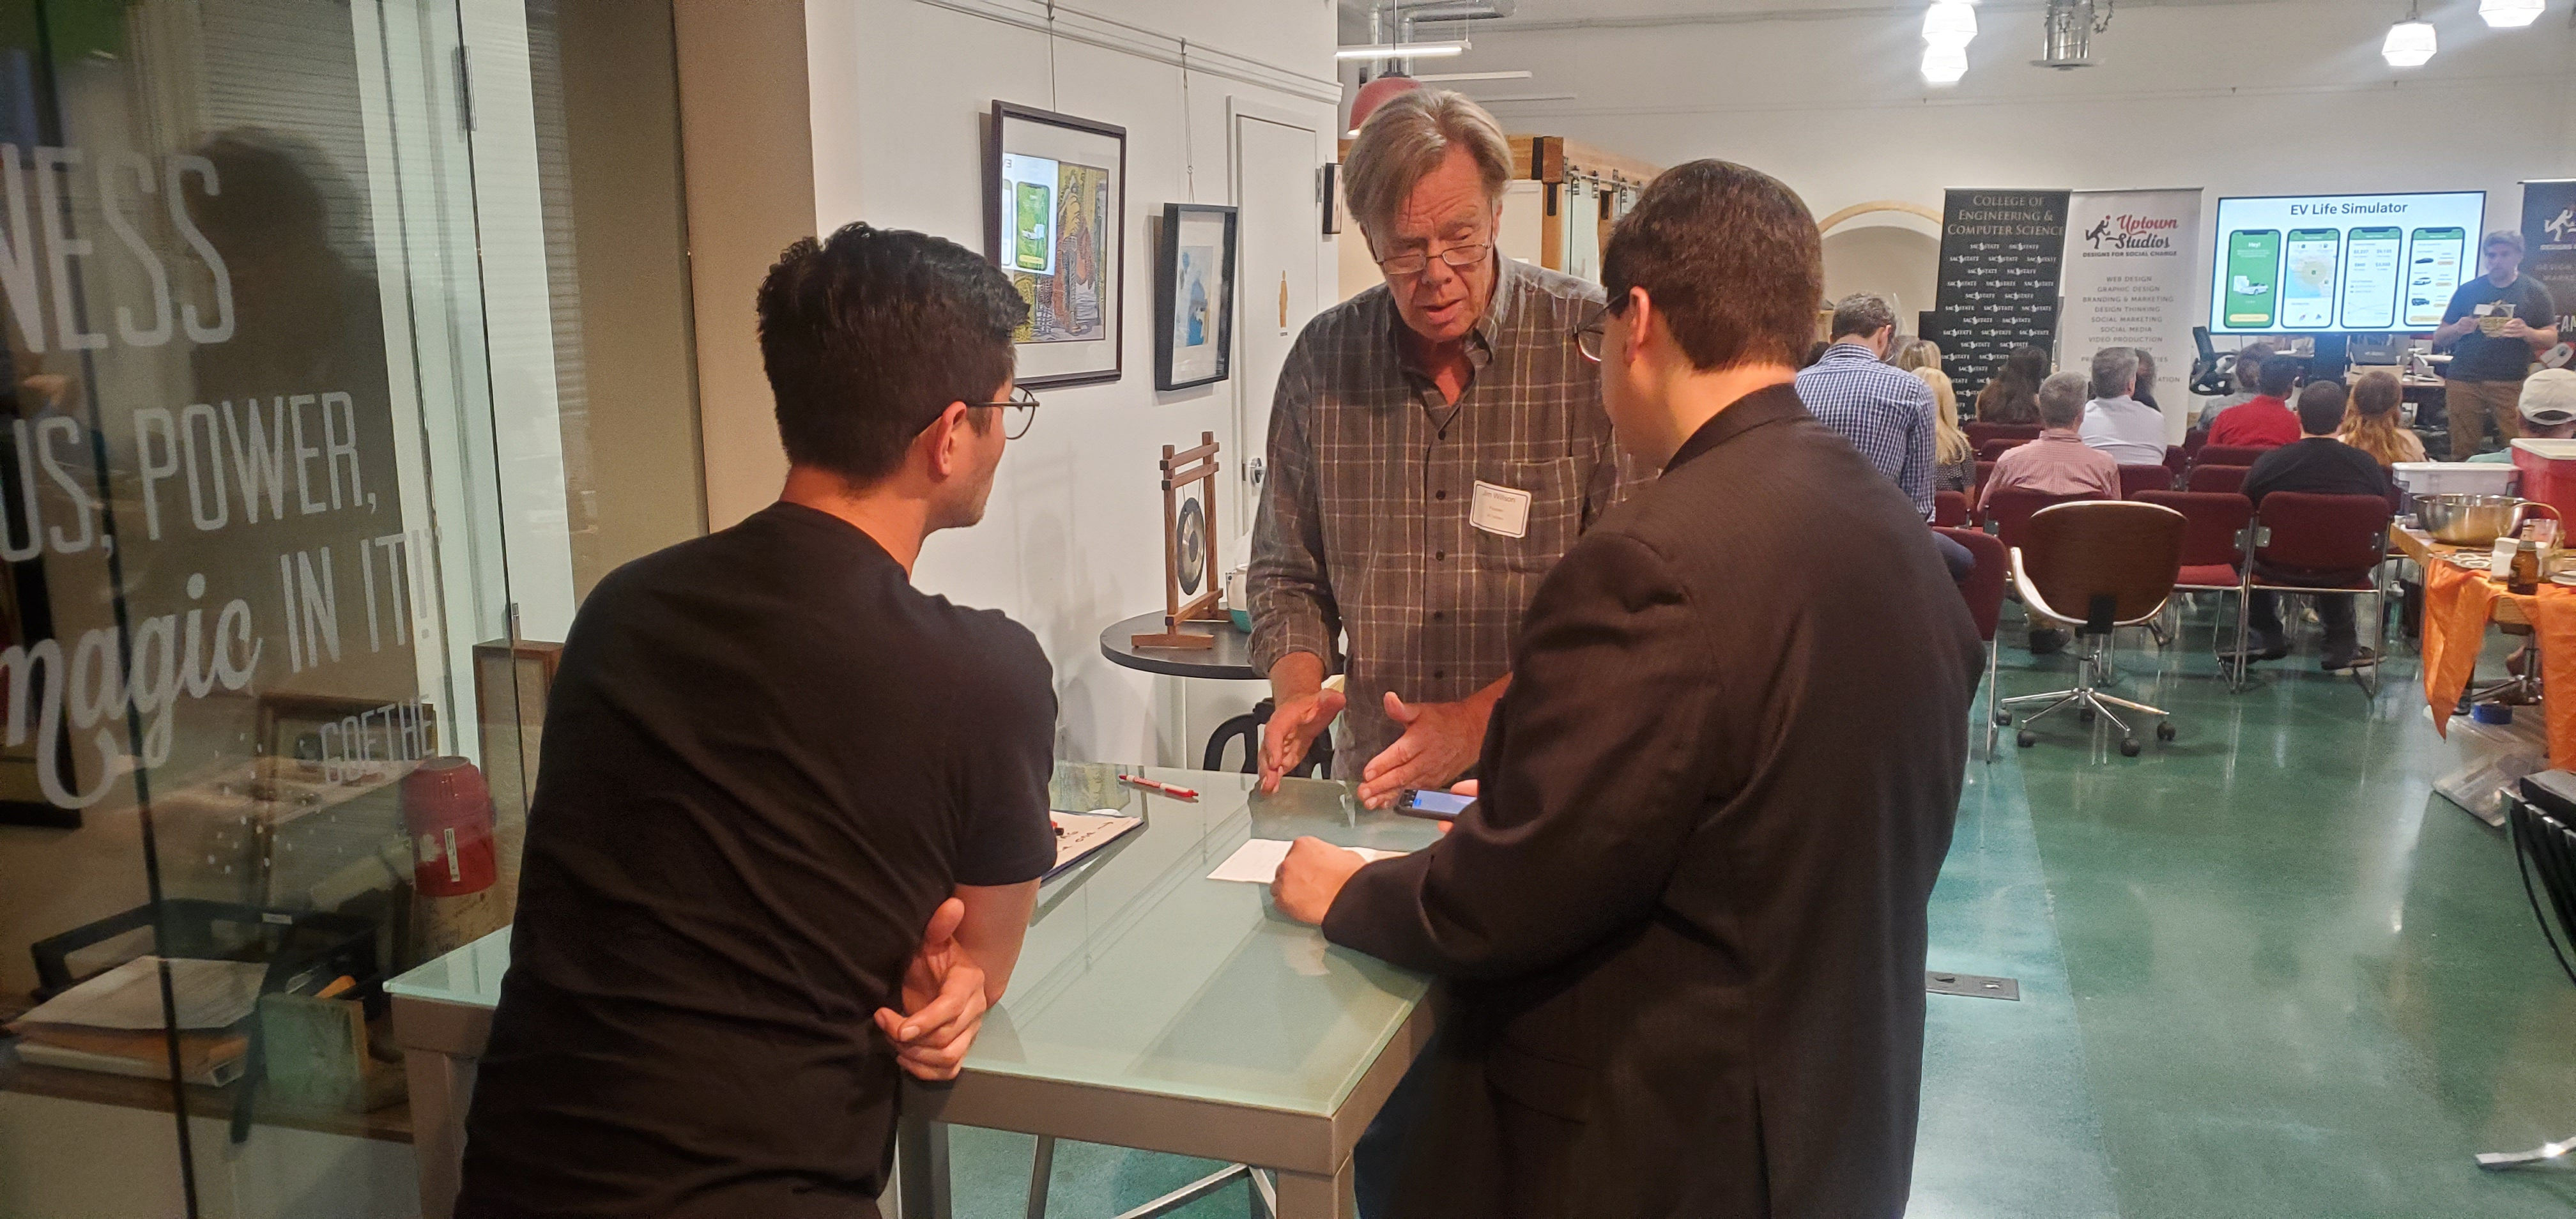 Prof Toups, CleanStart Ass Christian Maldonado talk with Jim